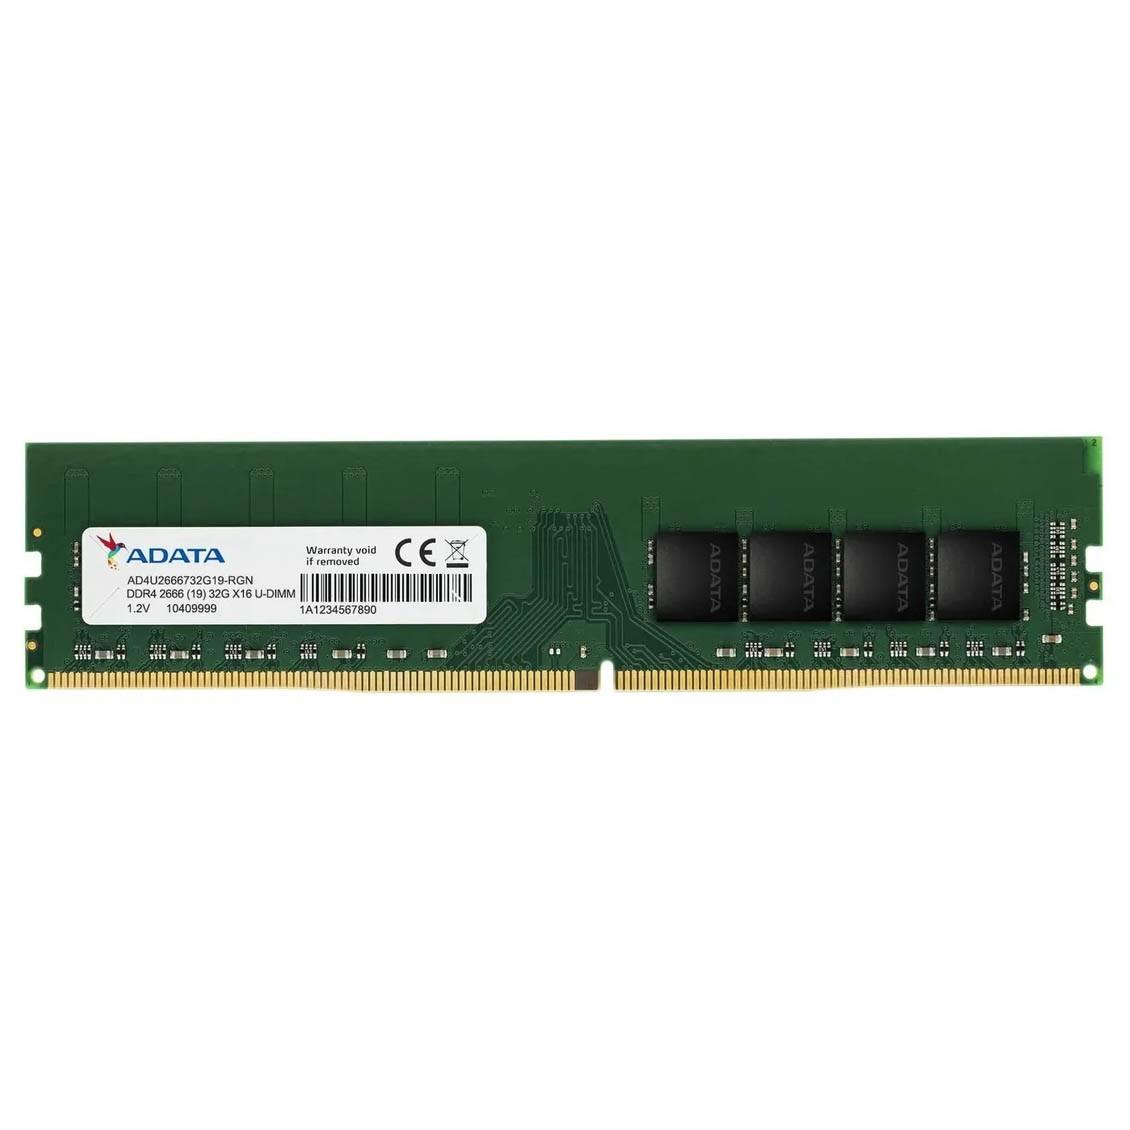 Memoria P/ Desktop 16gb Ddr4 2666mhz Dimm Adata Ad4u2666716g19-b